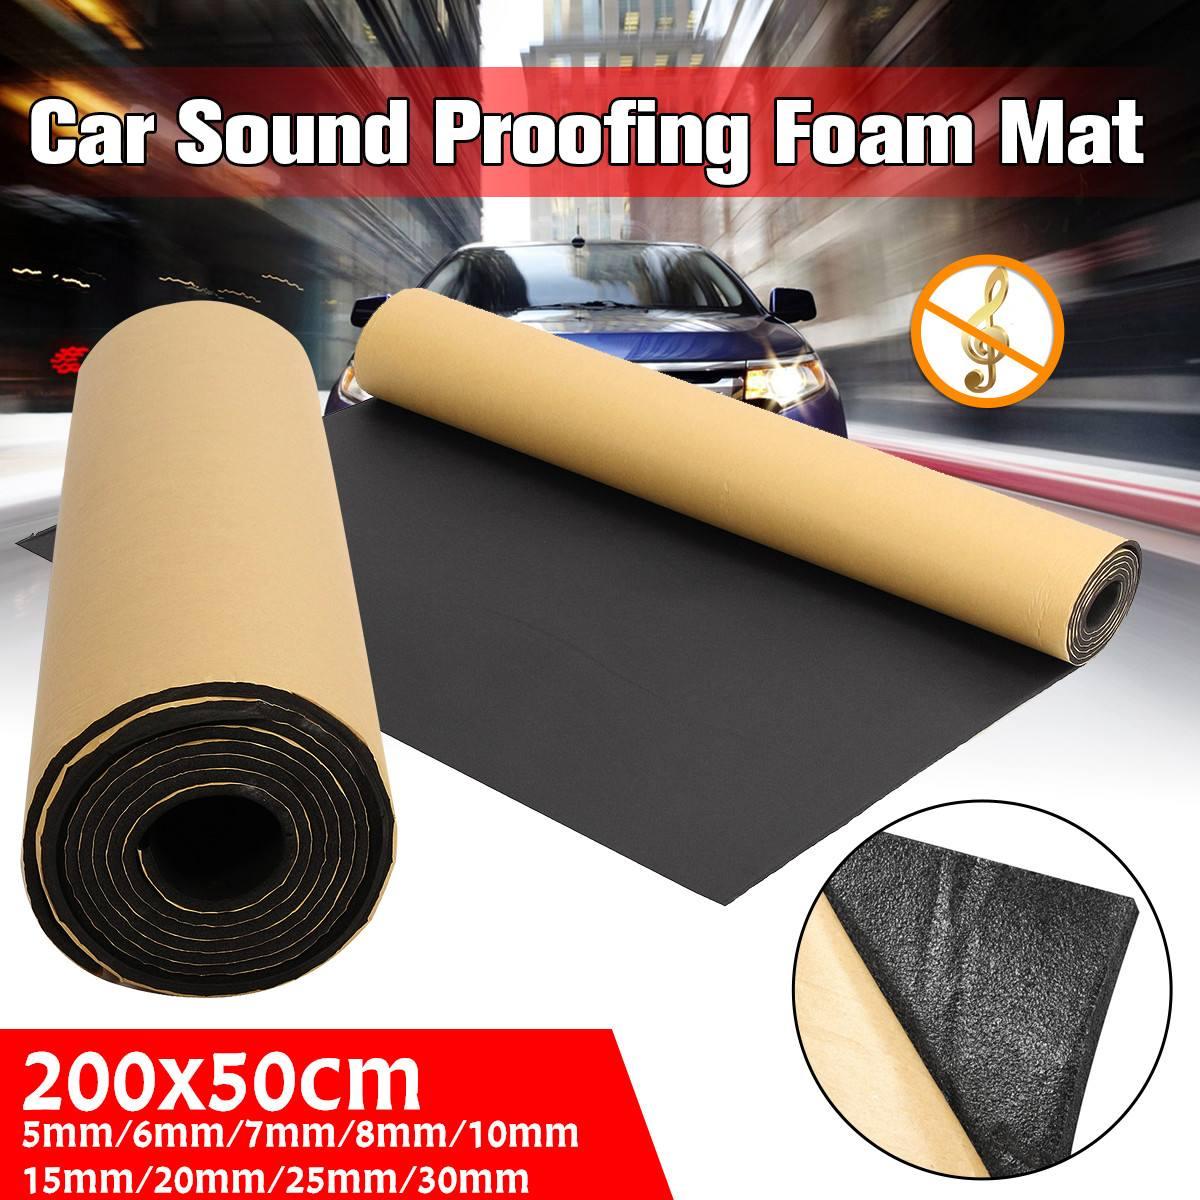 200cmx50cm 5mm-30mm Car Sound Proofing Deadening Car Truck Anti-noise Sound Insulation Cotton Heat Closed Cell Foam